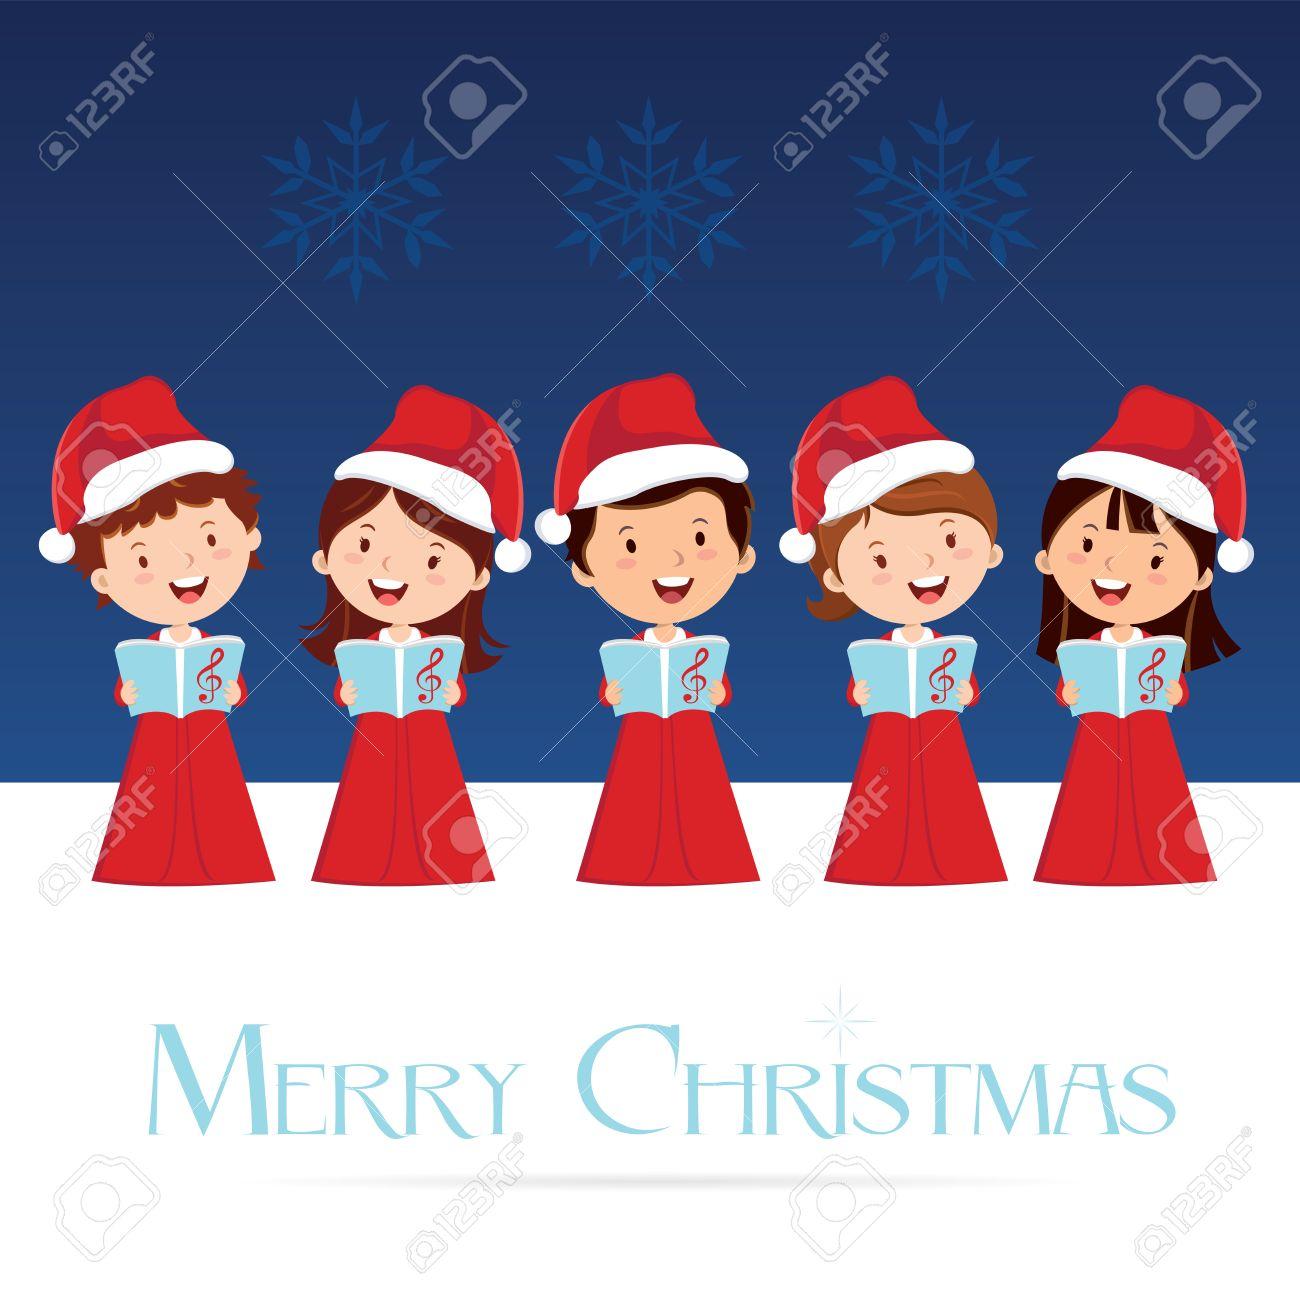 Christmas Choir.Christmas Choir Christmas Carols